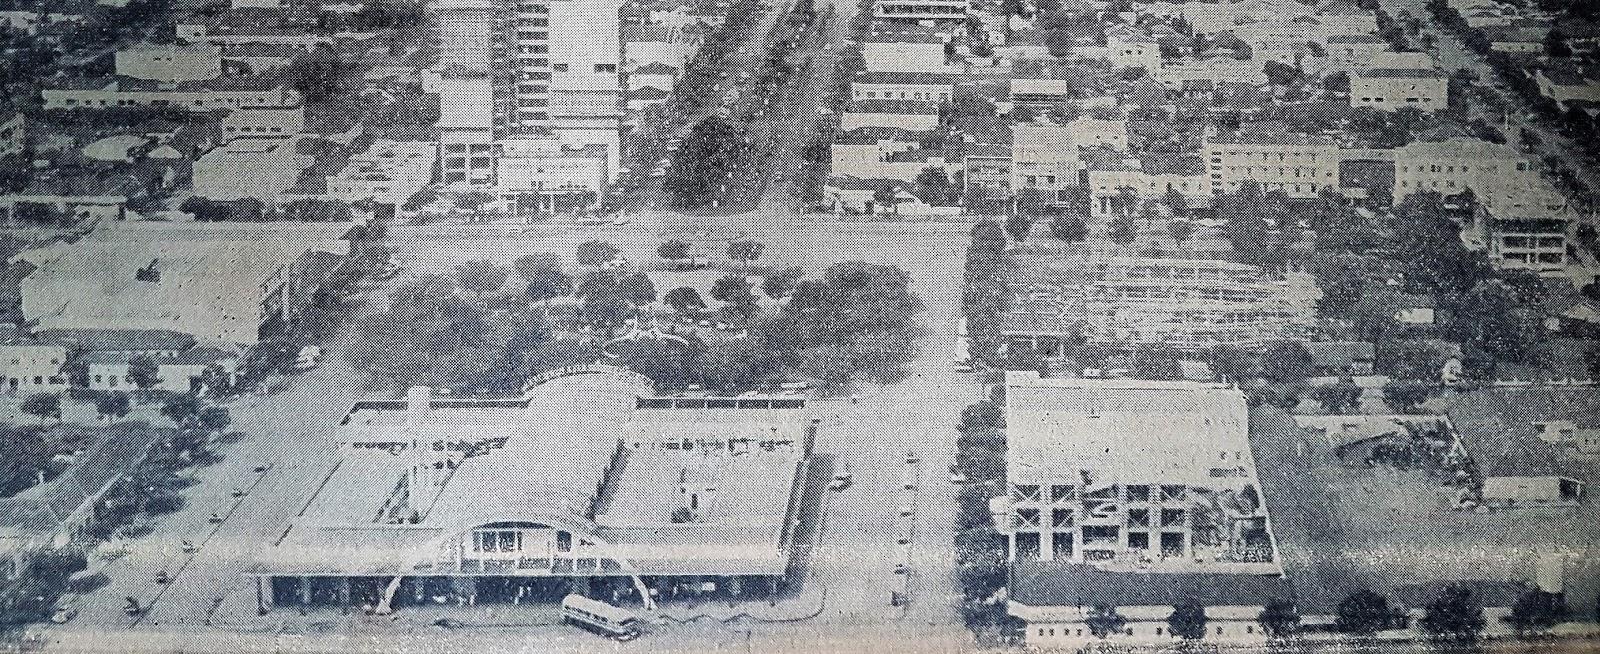 Eixo monumental - 1964